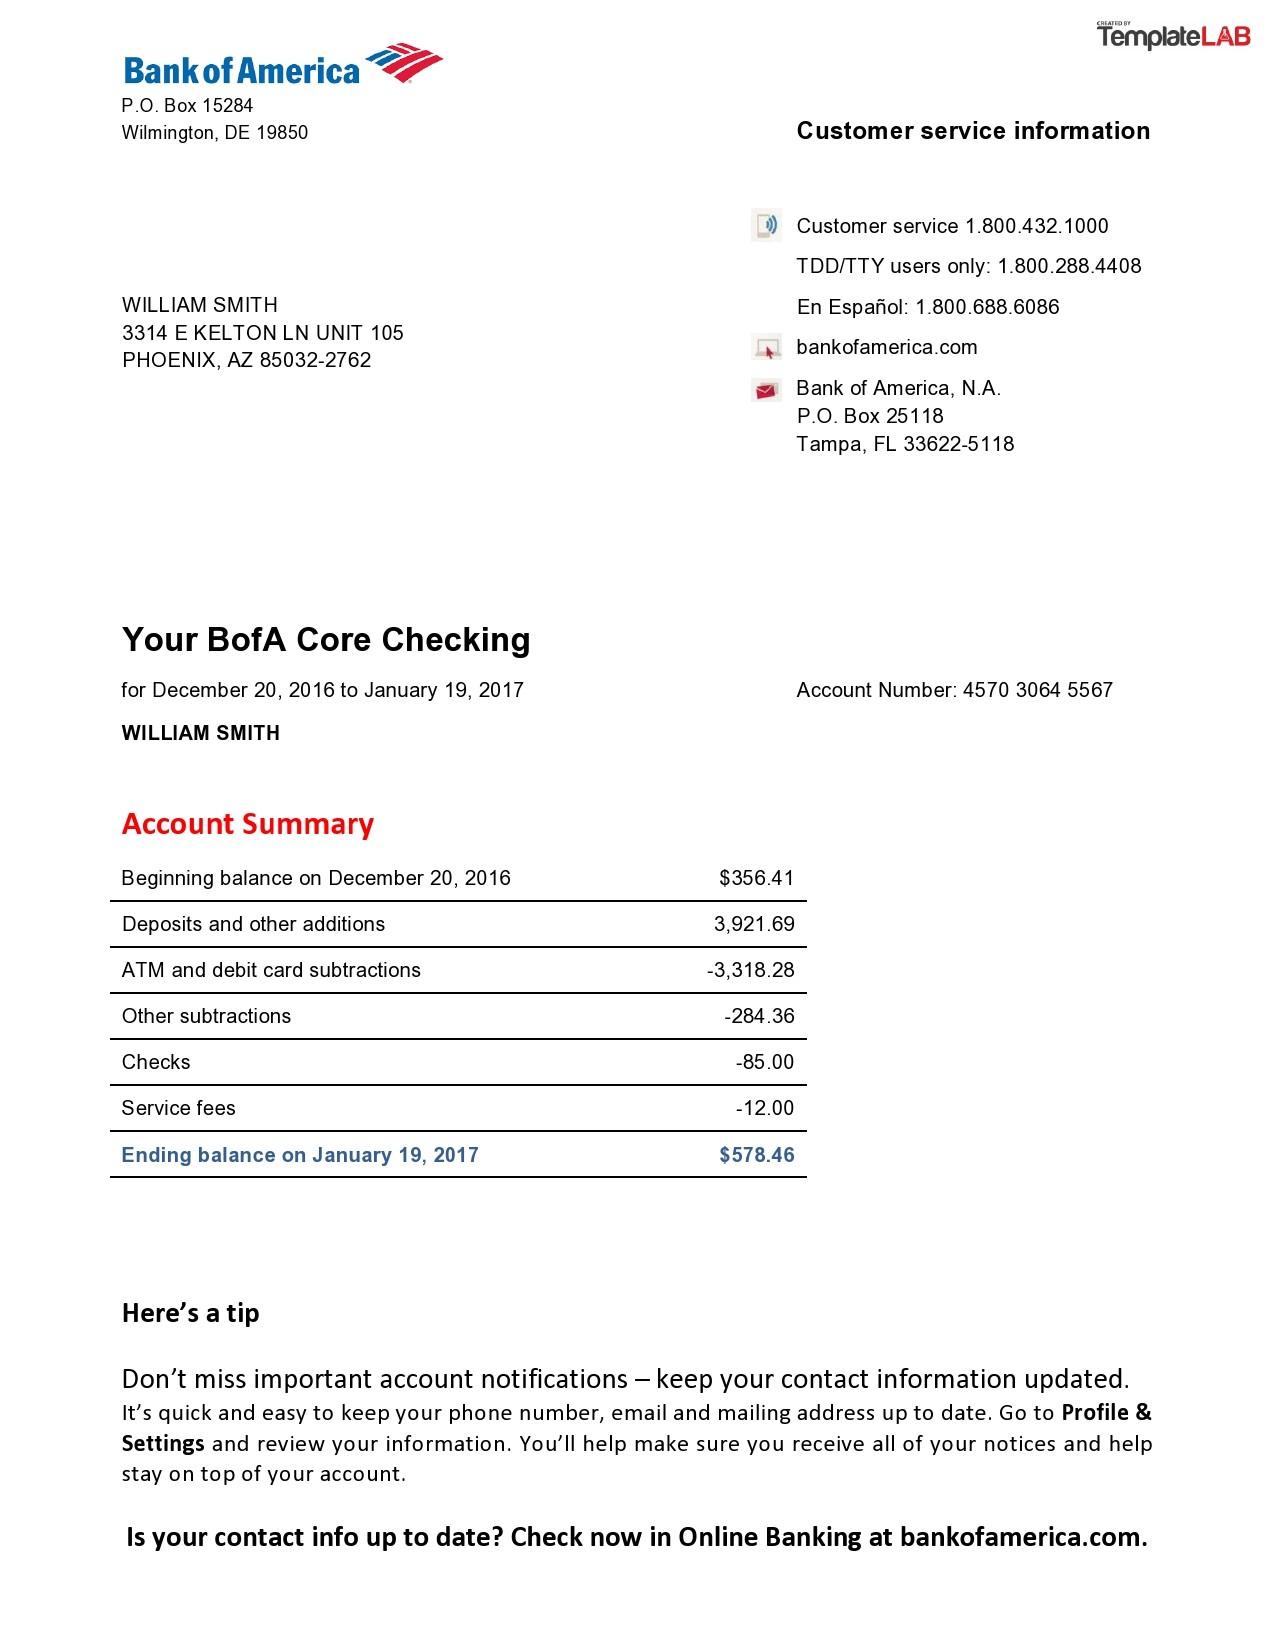 Free Bank of America Bank Statement - TemplateLab.com